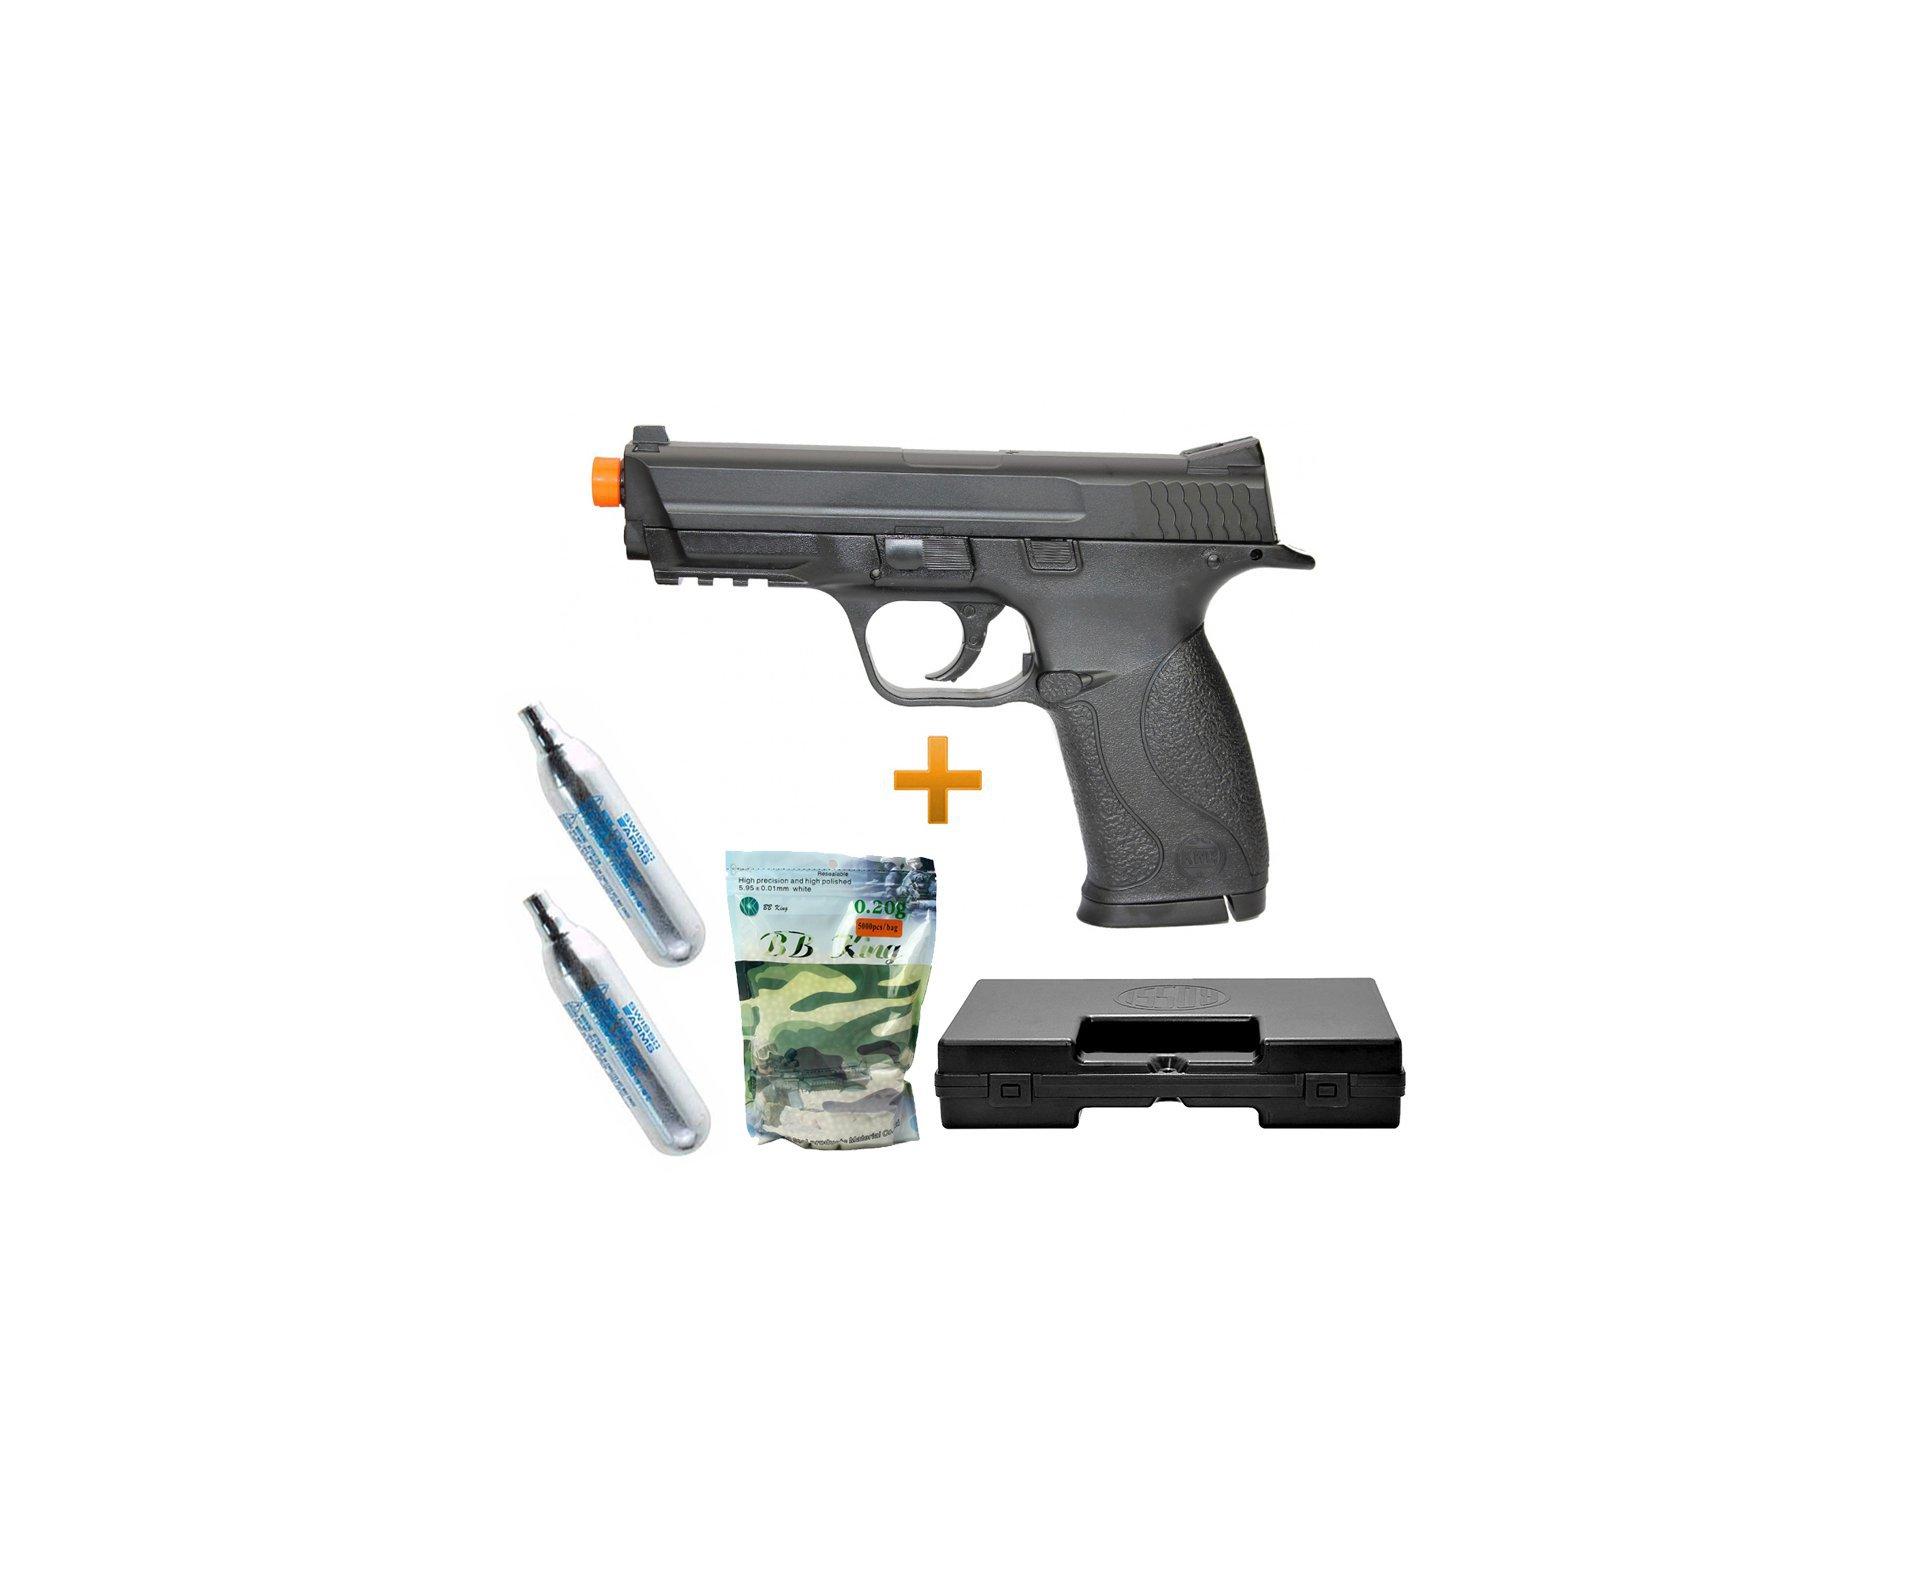 Pistola De Airsoft Gas Co2 S&w Mp40 Slide Metal Cal 6.0mm Kwc + Case + Bbs + 02 Co2